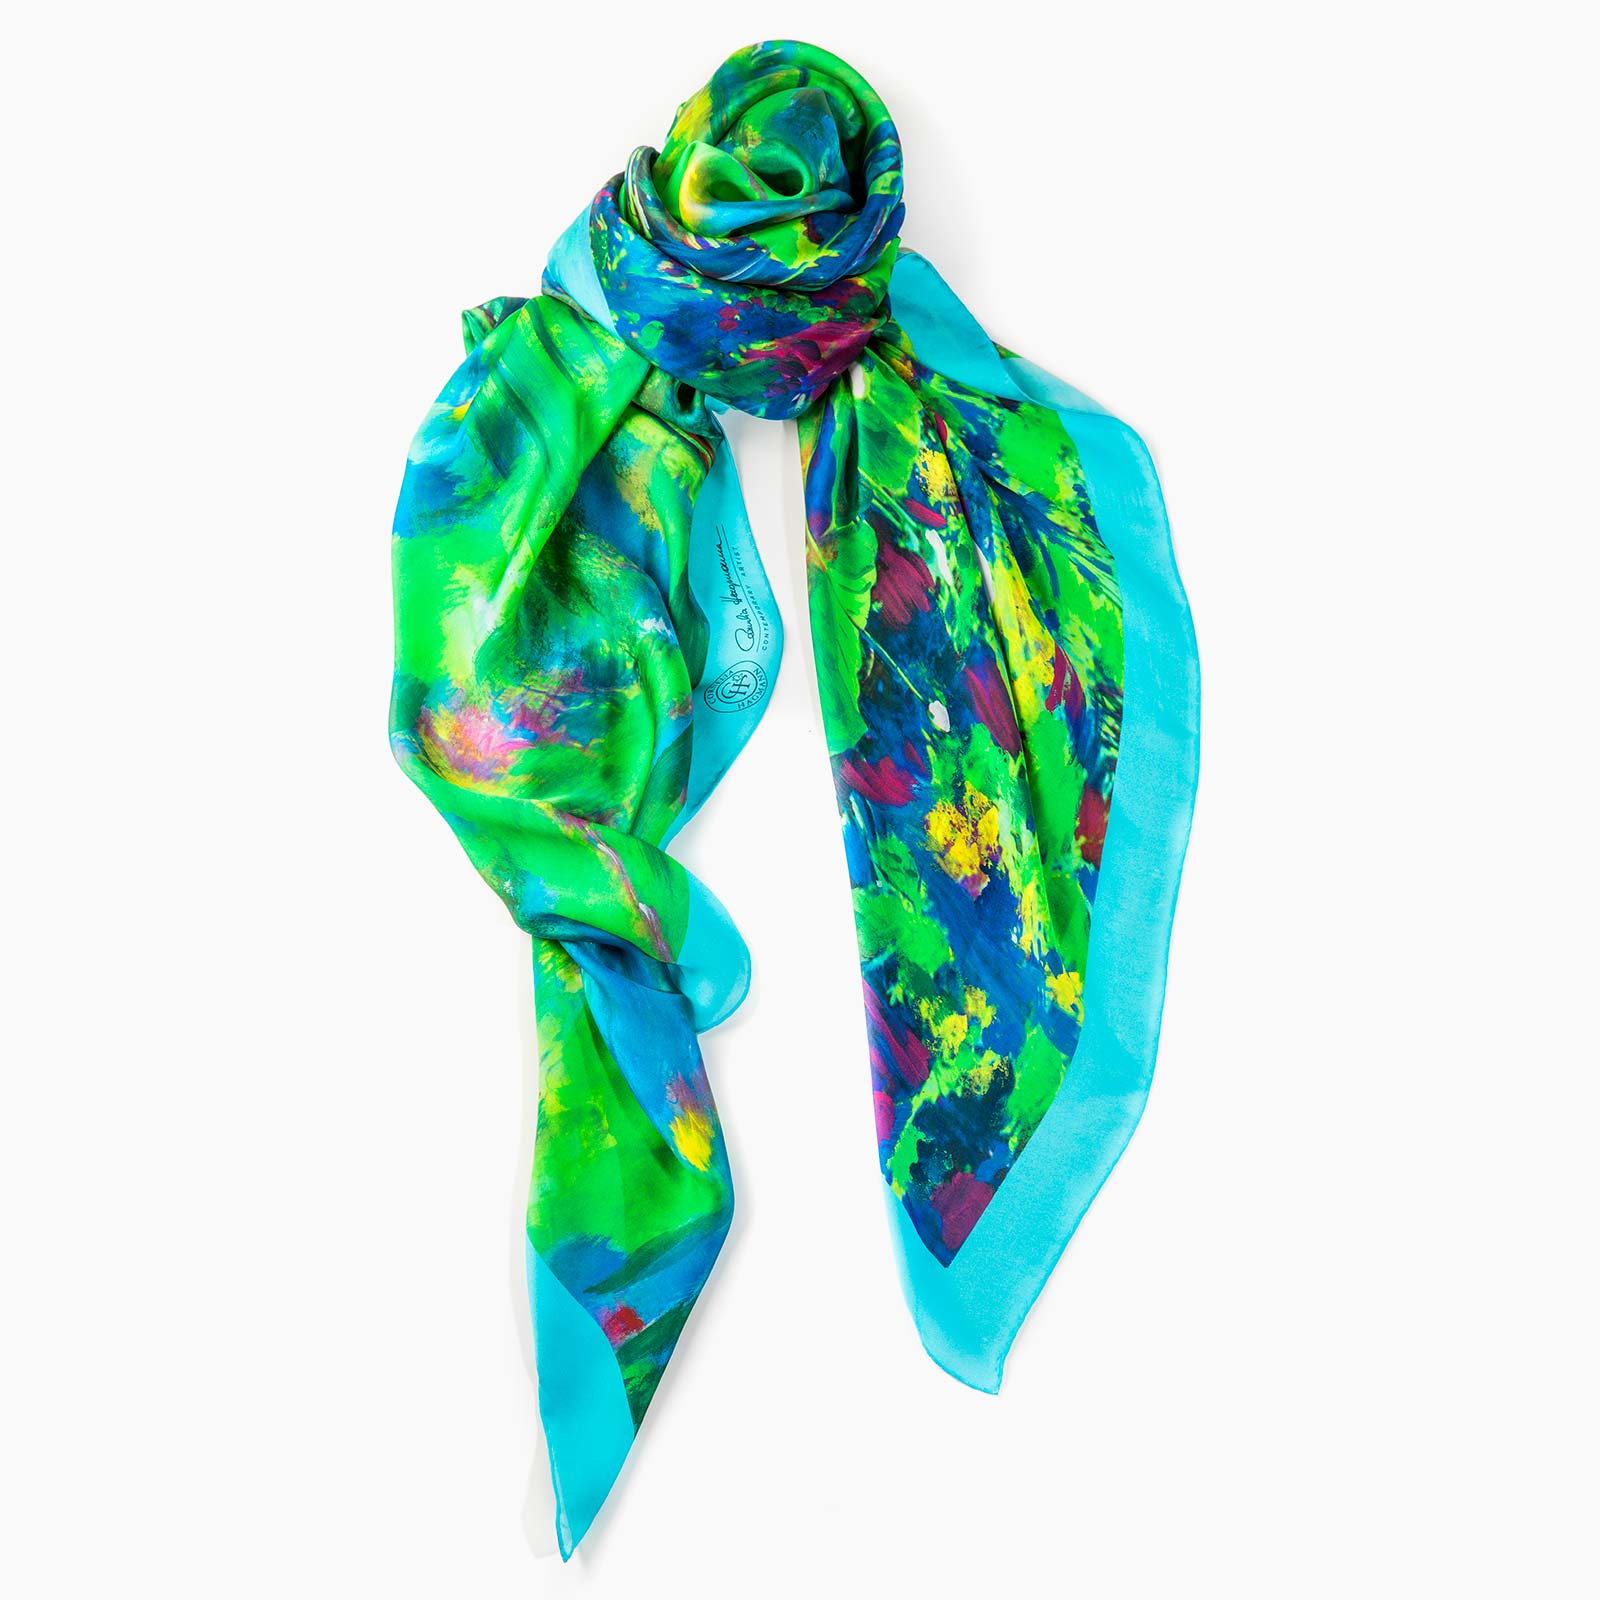 Cornelia Hagmann Contemporary Artist La Galleria Silk Scarf Green Pond Turquoise, Seidenschal, sciarpa di seta, foulard soie,